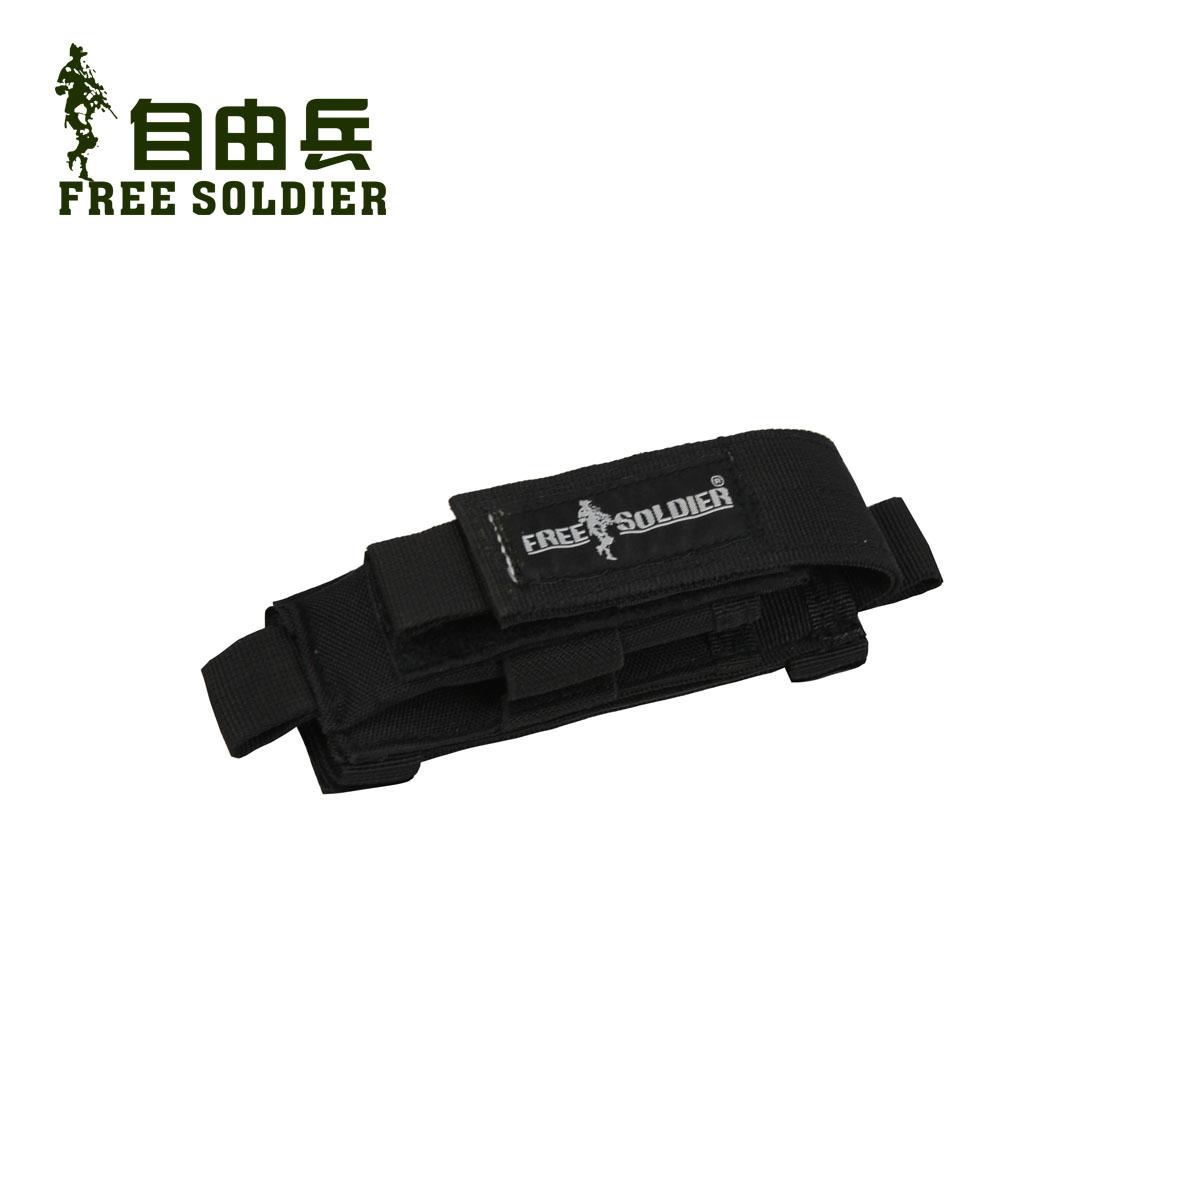 Аксессуары для активного отдыха Free Soldier FS/b17 FS-B17 Free Soldier / free soldiers